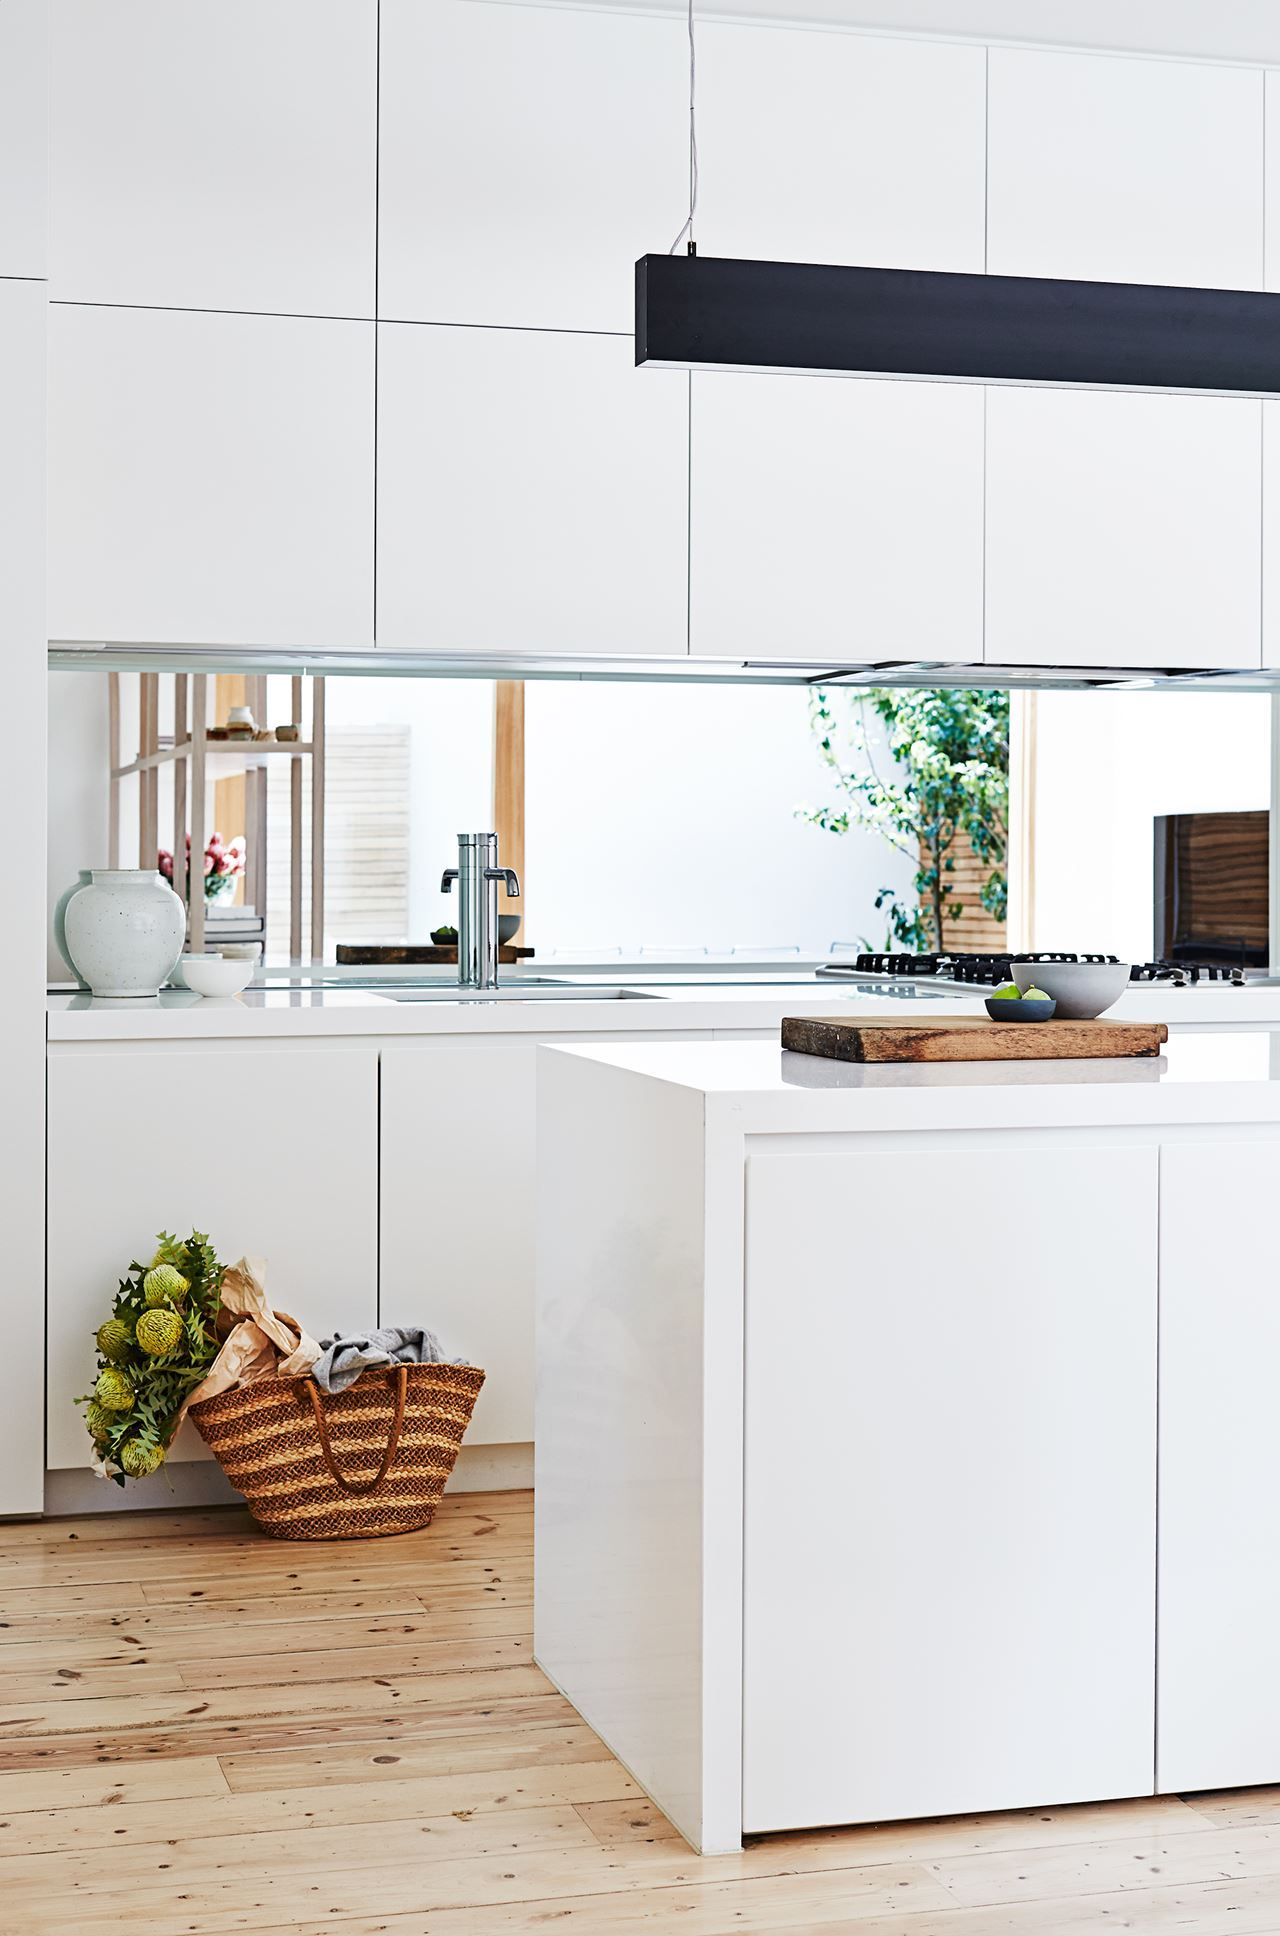 kitchen matt pendant lighting gallery penny s fresh edwardian house renovation black white handleless cabinets mirror splashback long light storage in island